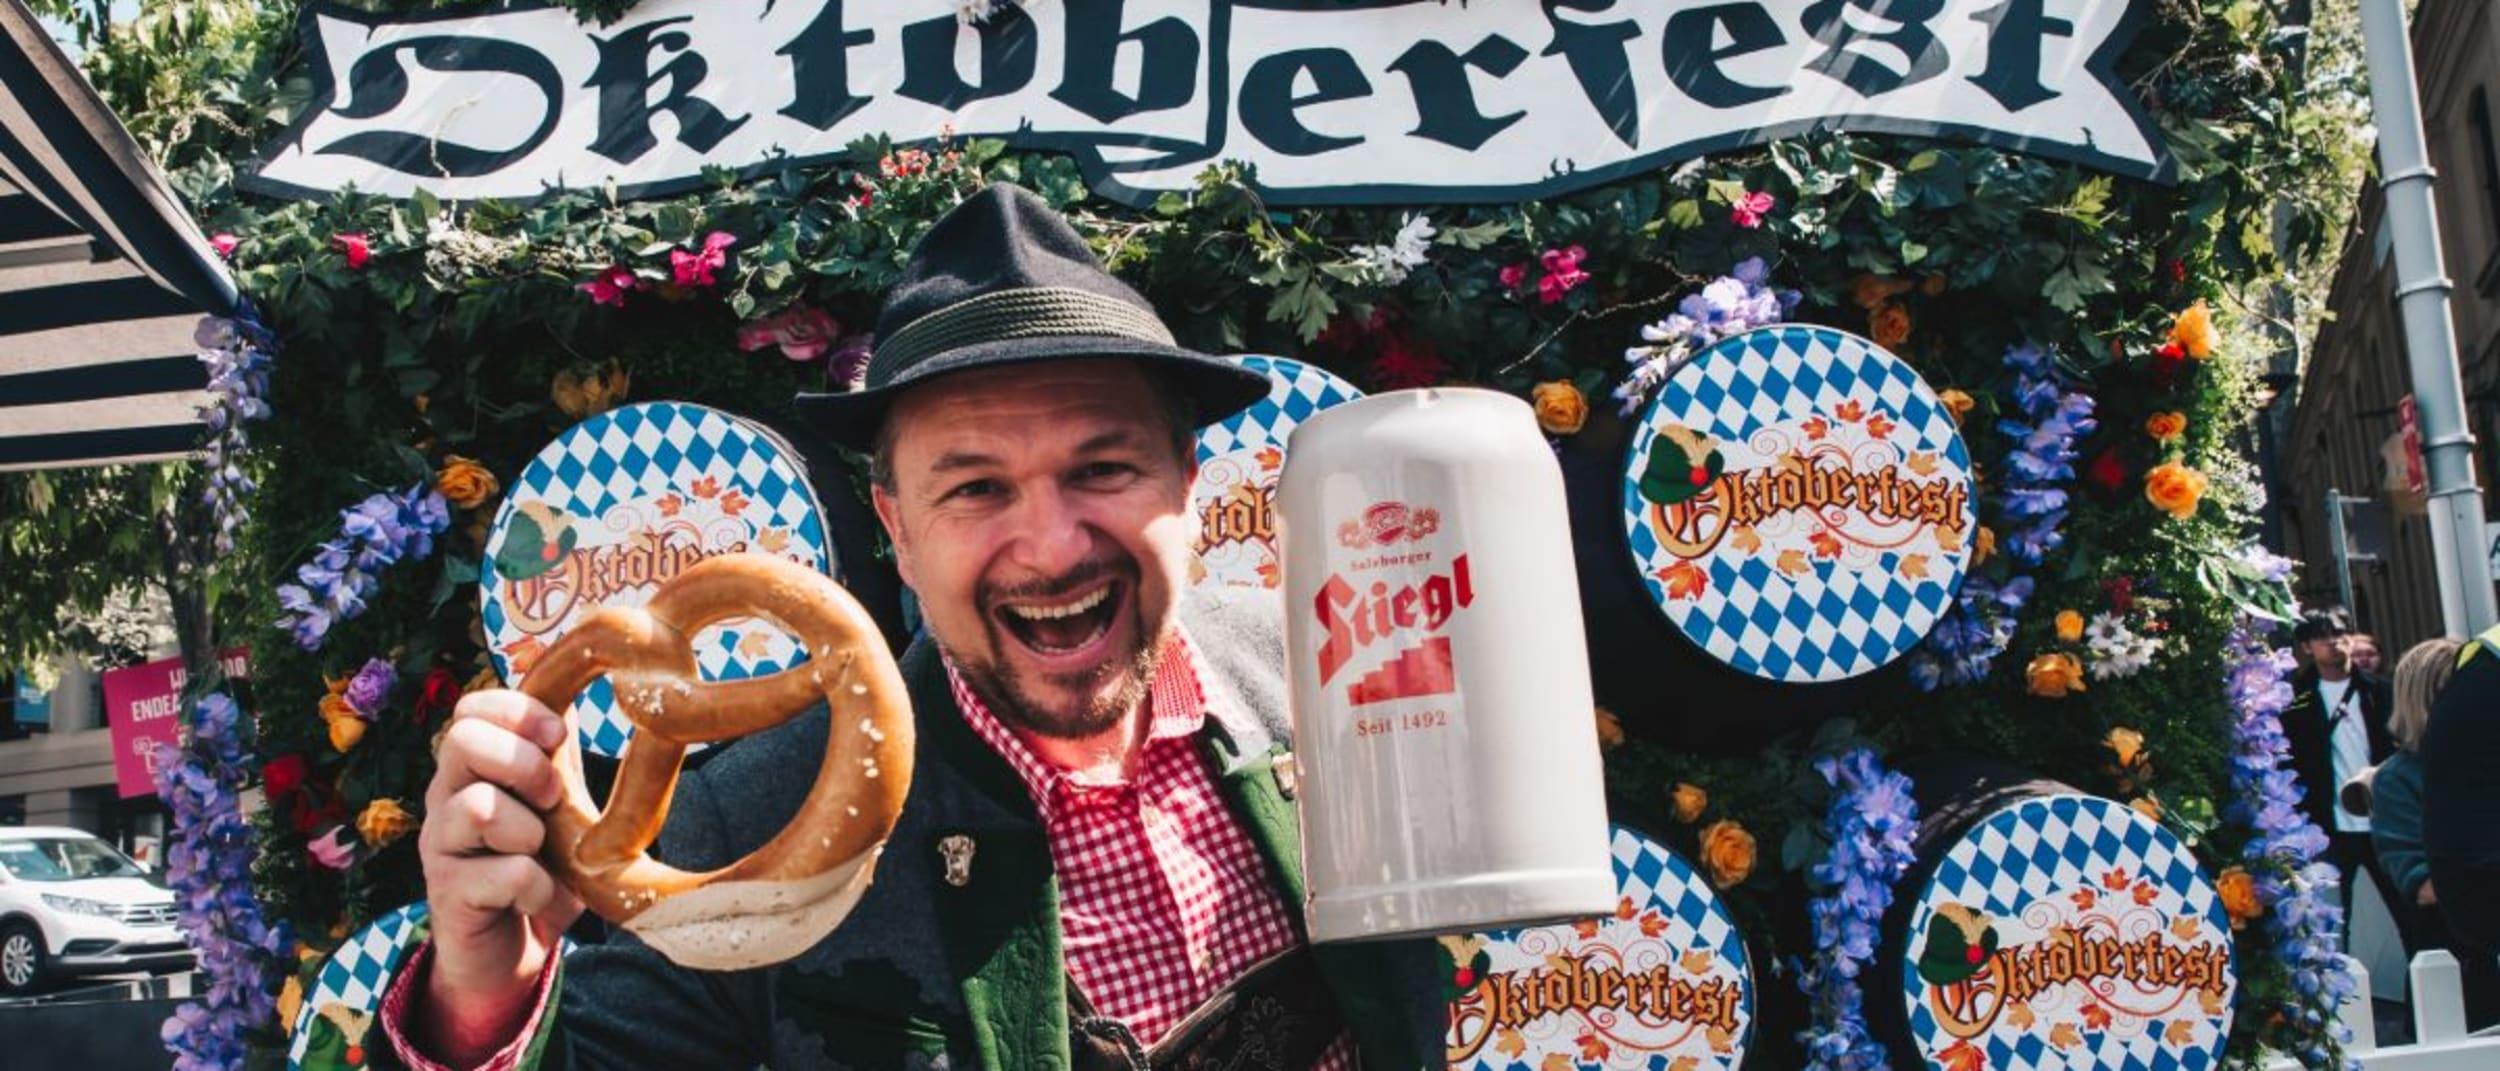 Celebrate Oktoberfest at The Bavarian